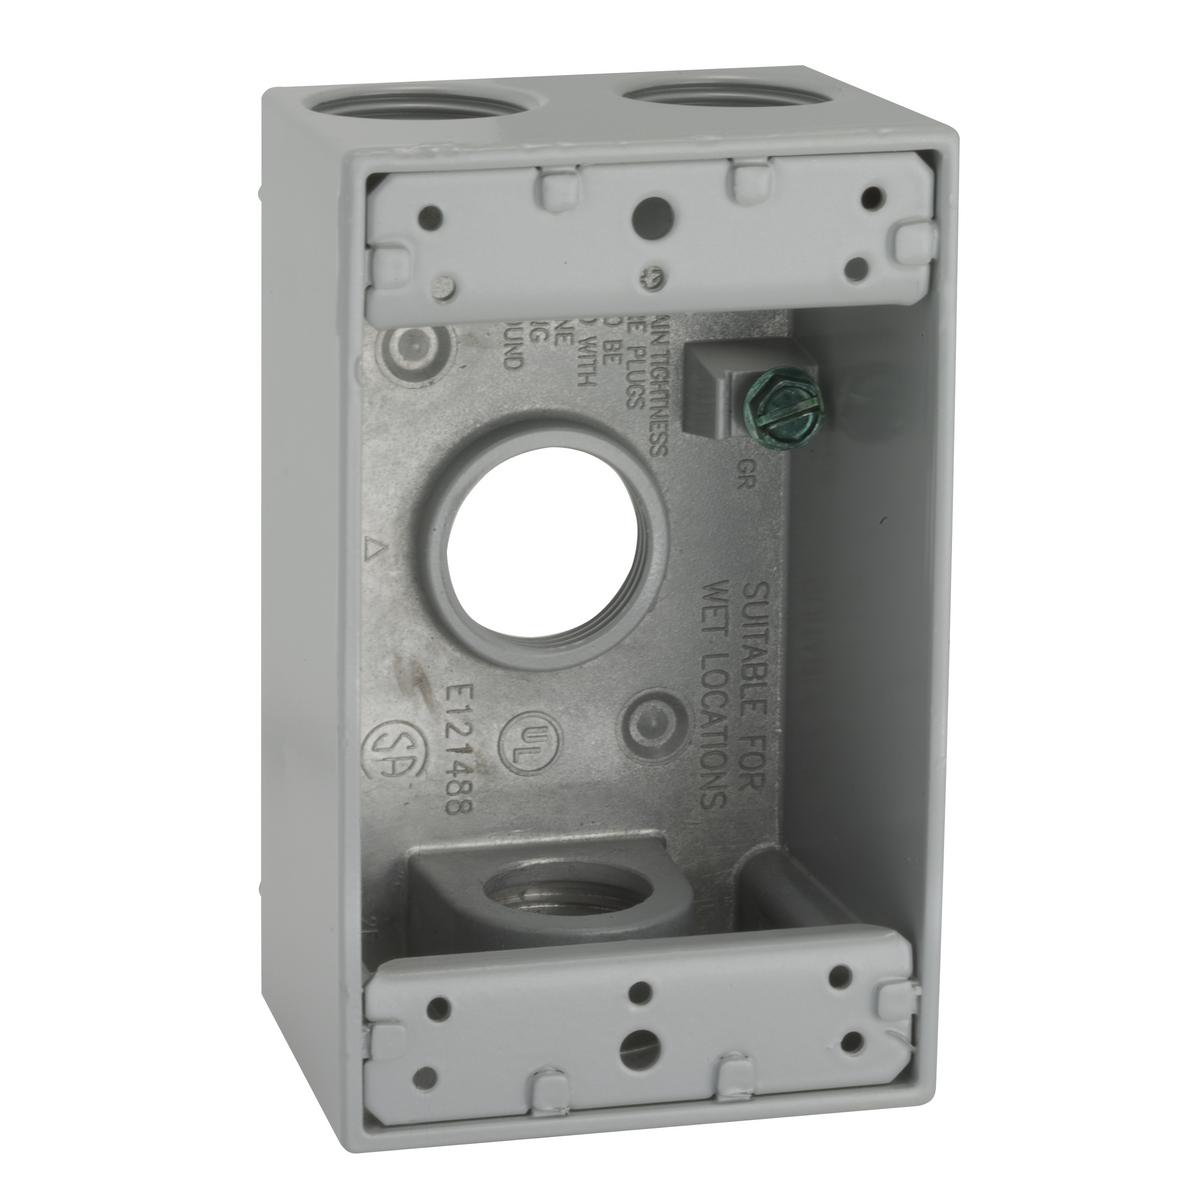 Hubbell-Raco 5330-0 BELL Gang Box